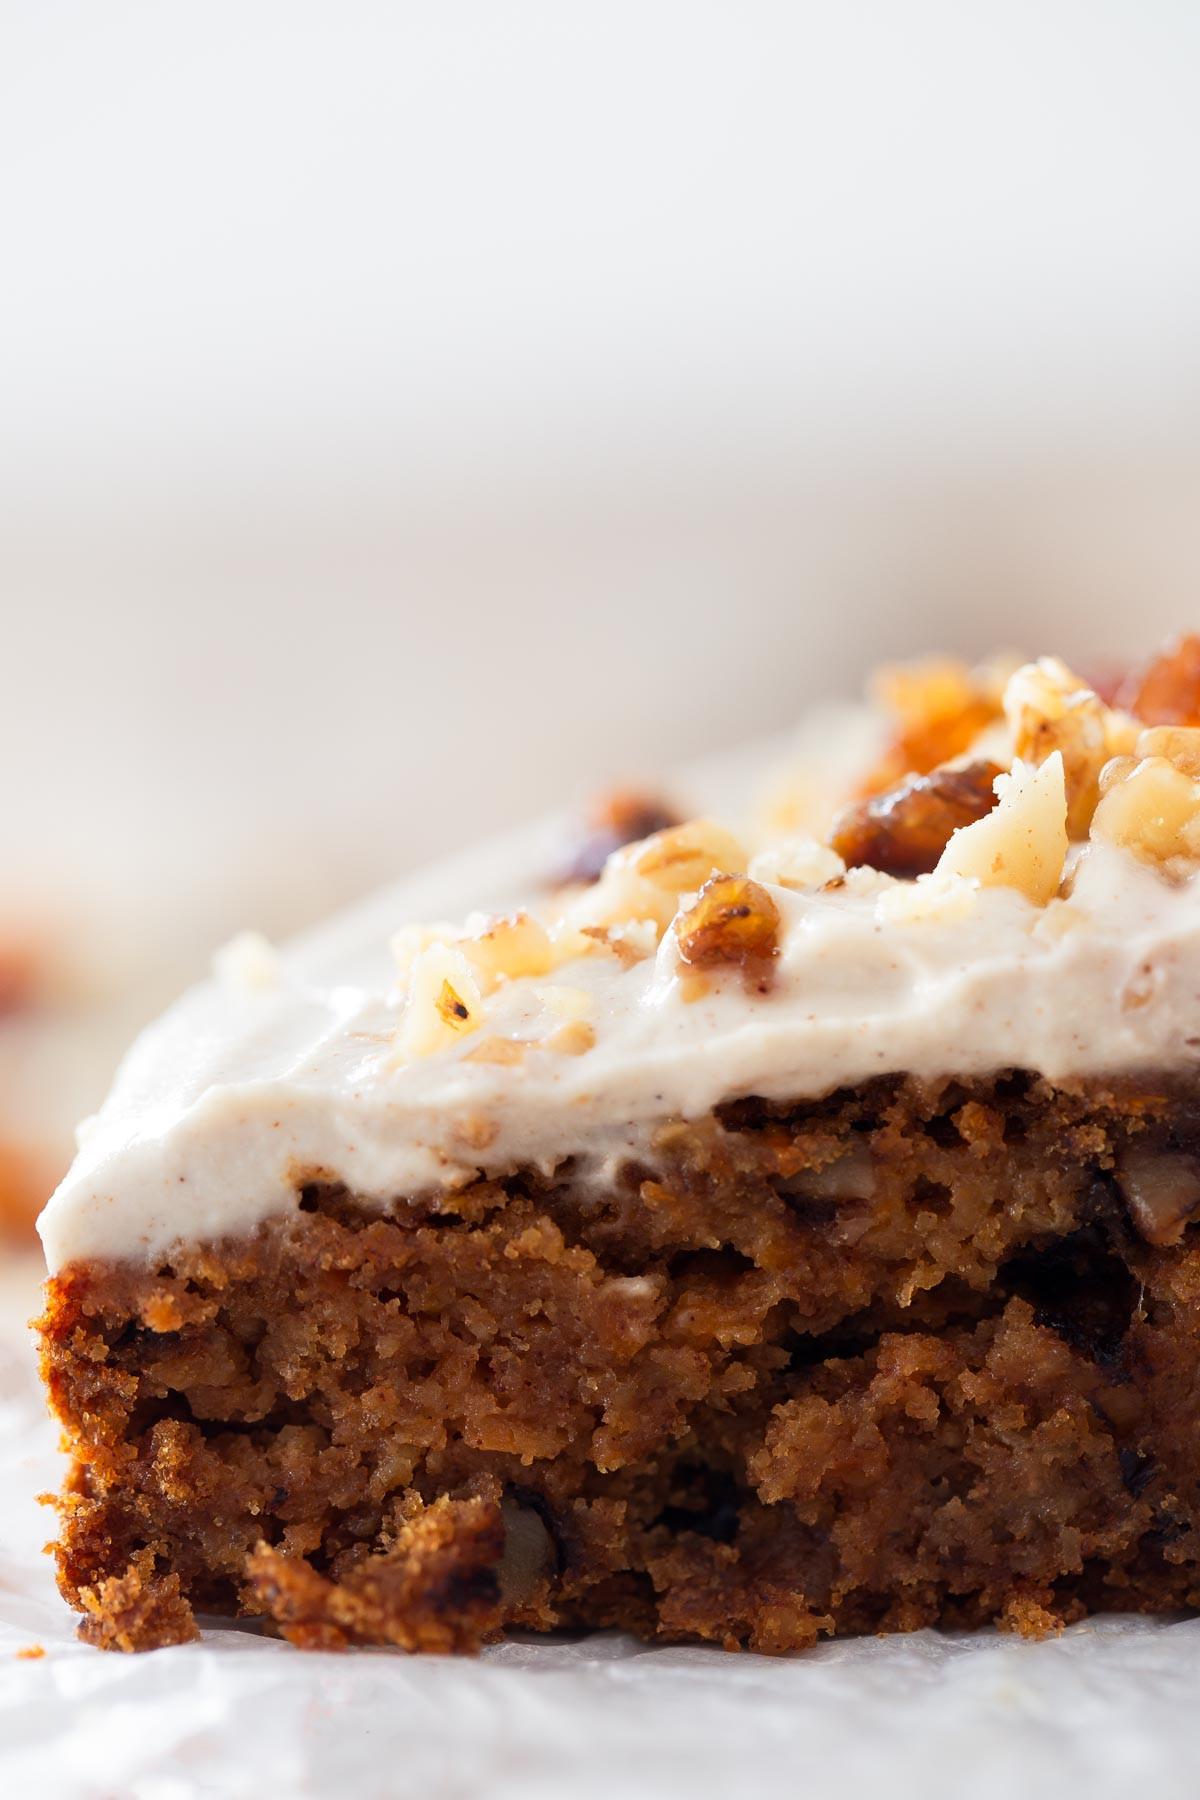 Vegan Carrot Cake Recipe  Vegan Carrot Cake Gluten Free